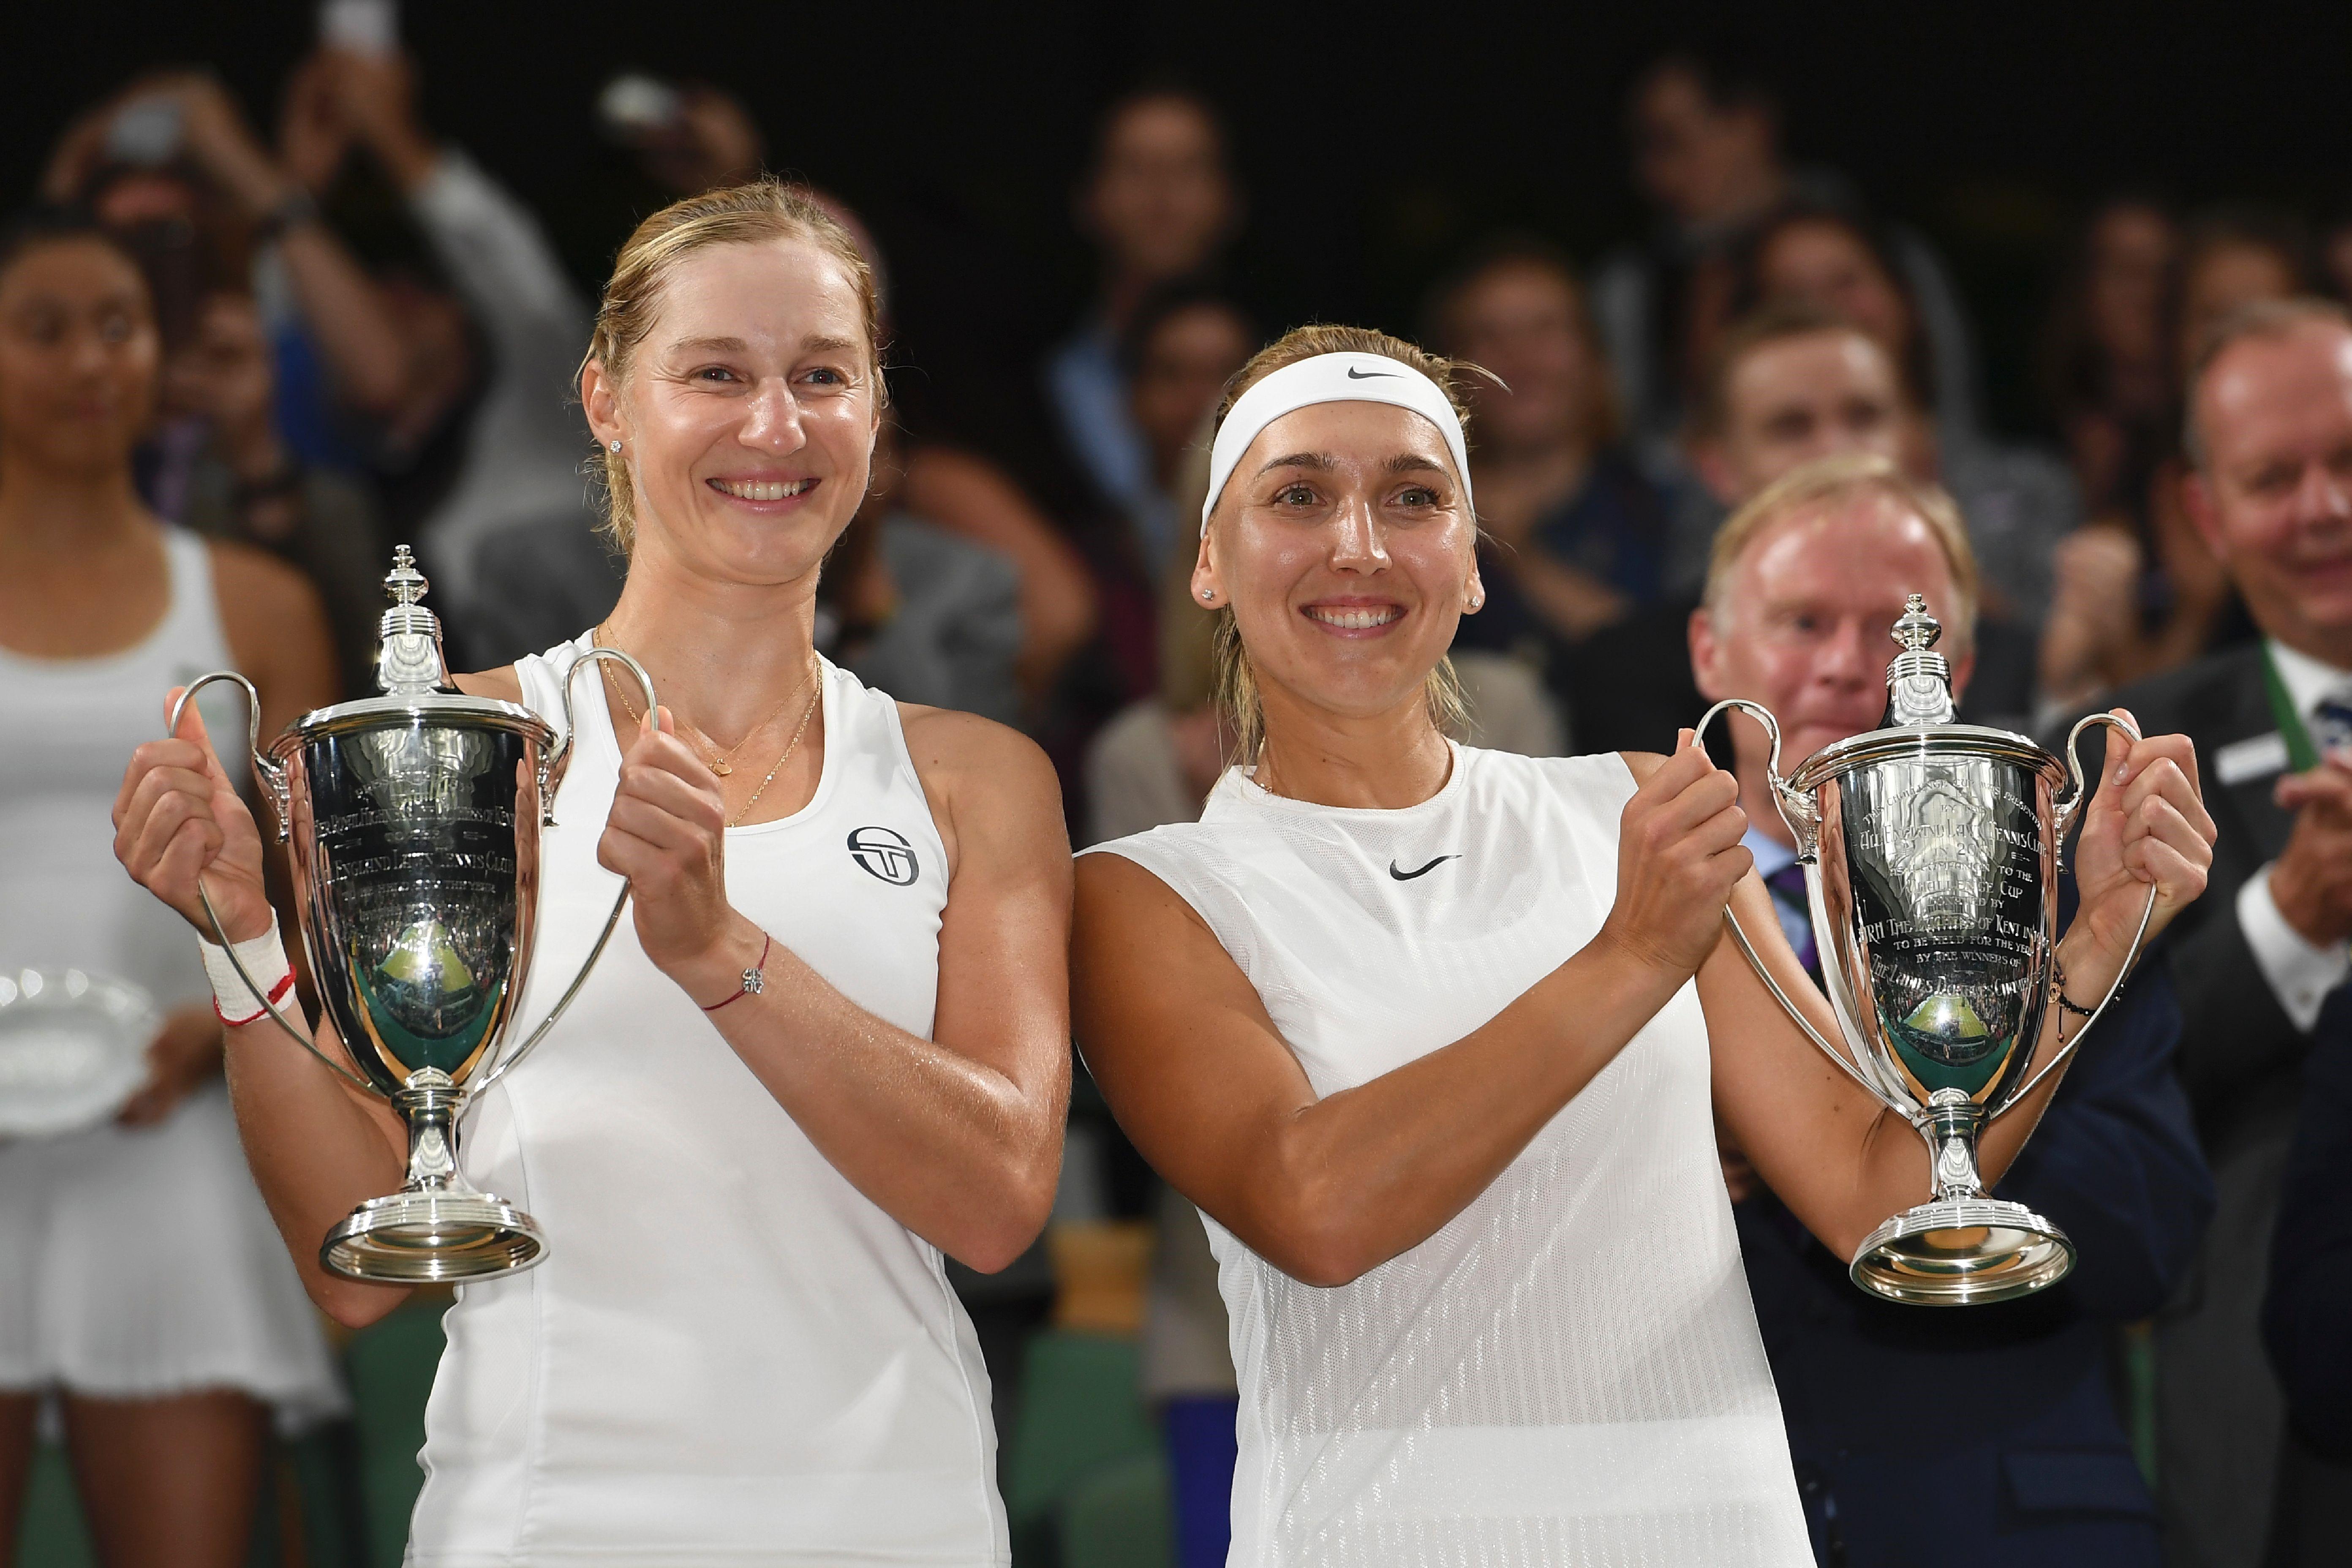 Екатерина Макарова и Елена Веснина – чемпионки Уимблдона-2017